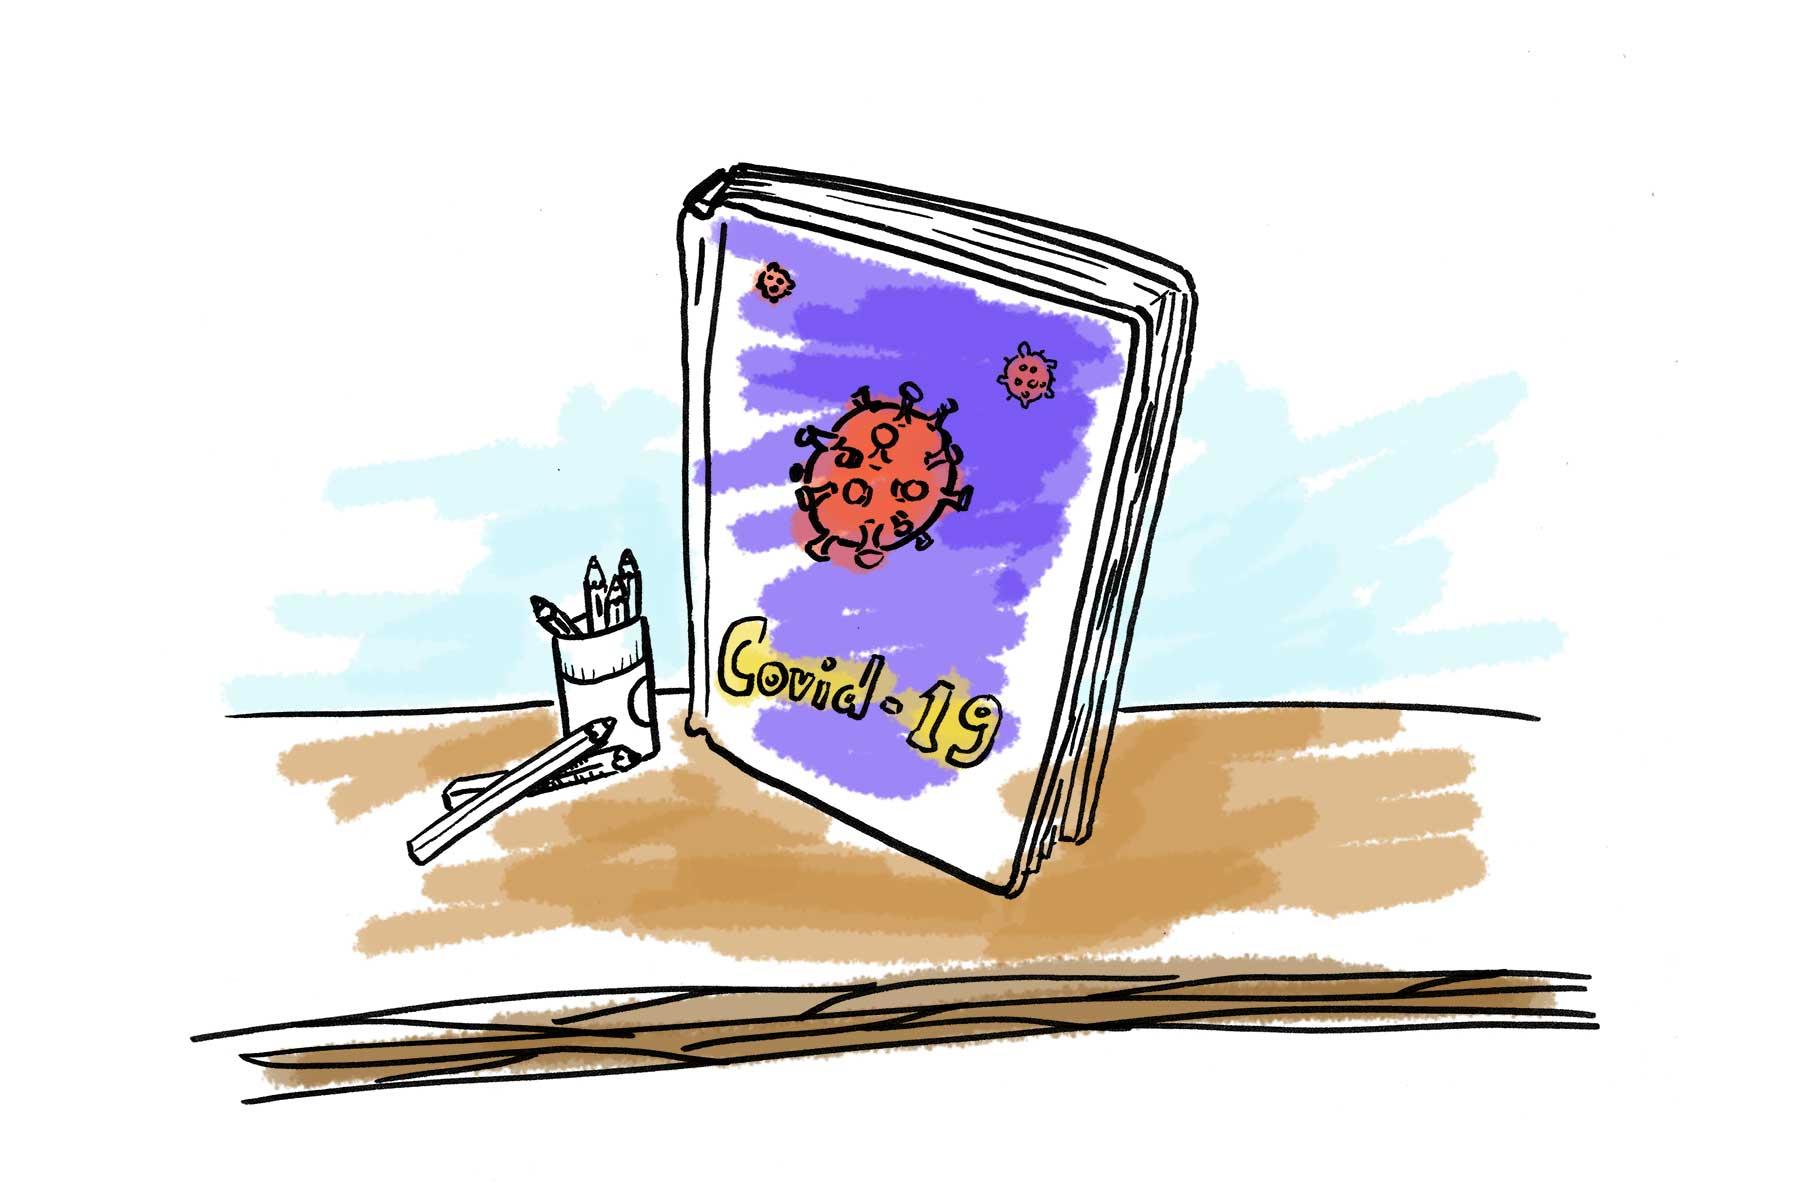 Das Coronavirus-Malbuch für Erwachsene Das-Coronavirus-Malbuch_00